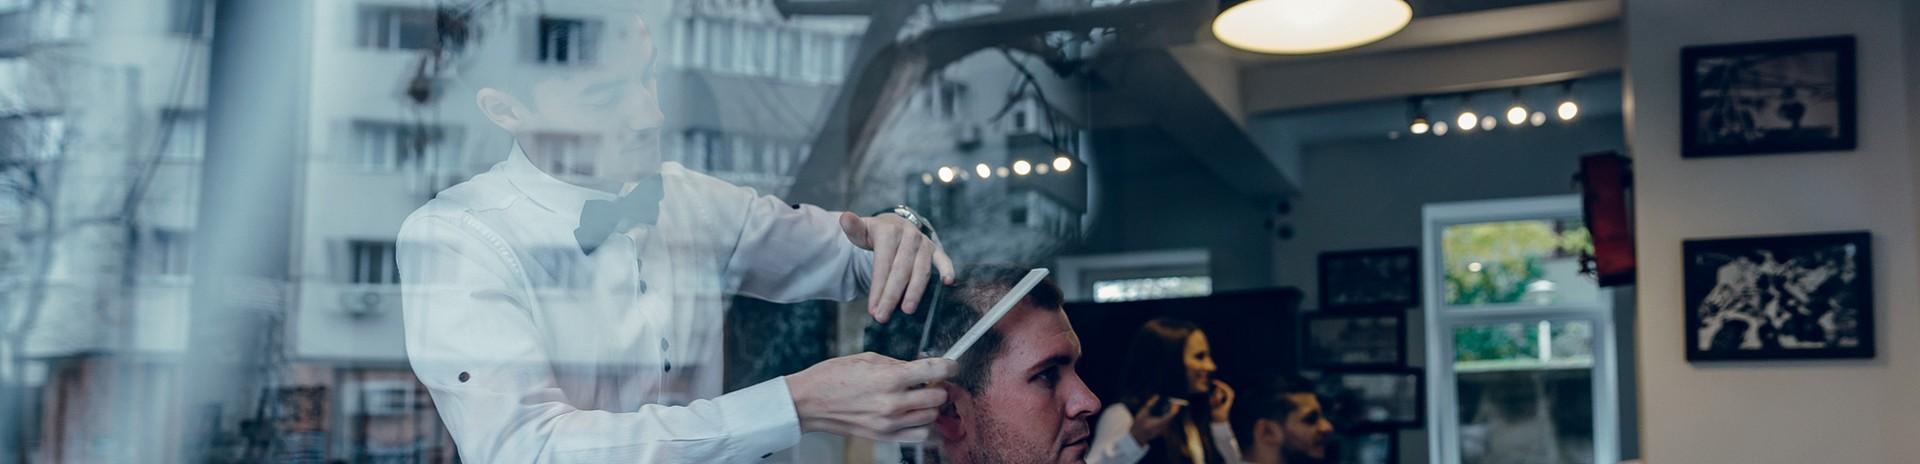 frizerie-titulescu-bucuresti-barber-shop-tuns-barba-the-barber-servicii